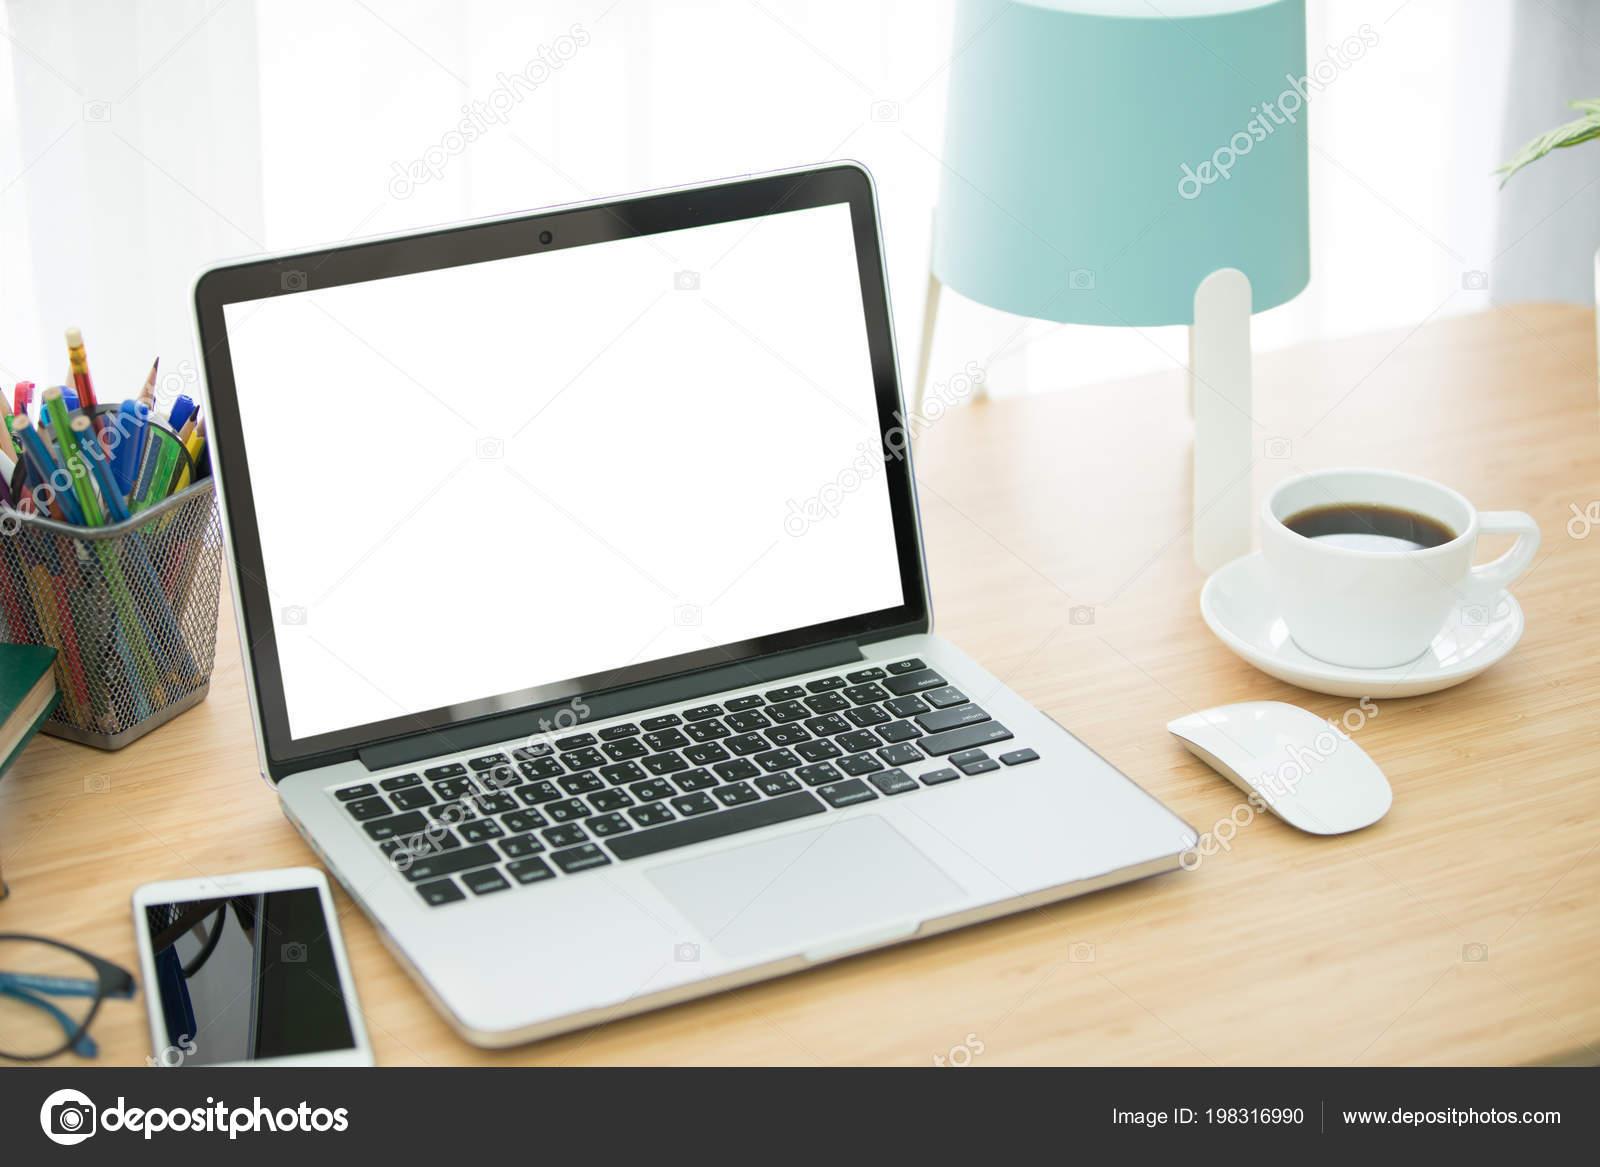 Workspace Background Desktop Office Accessories Table Stock